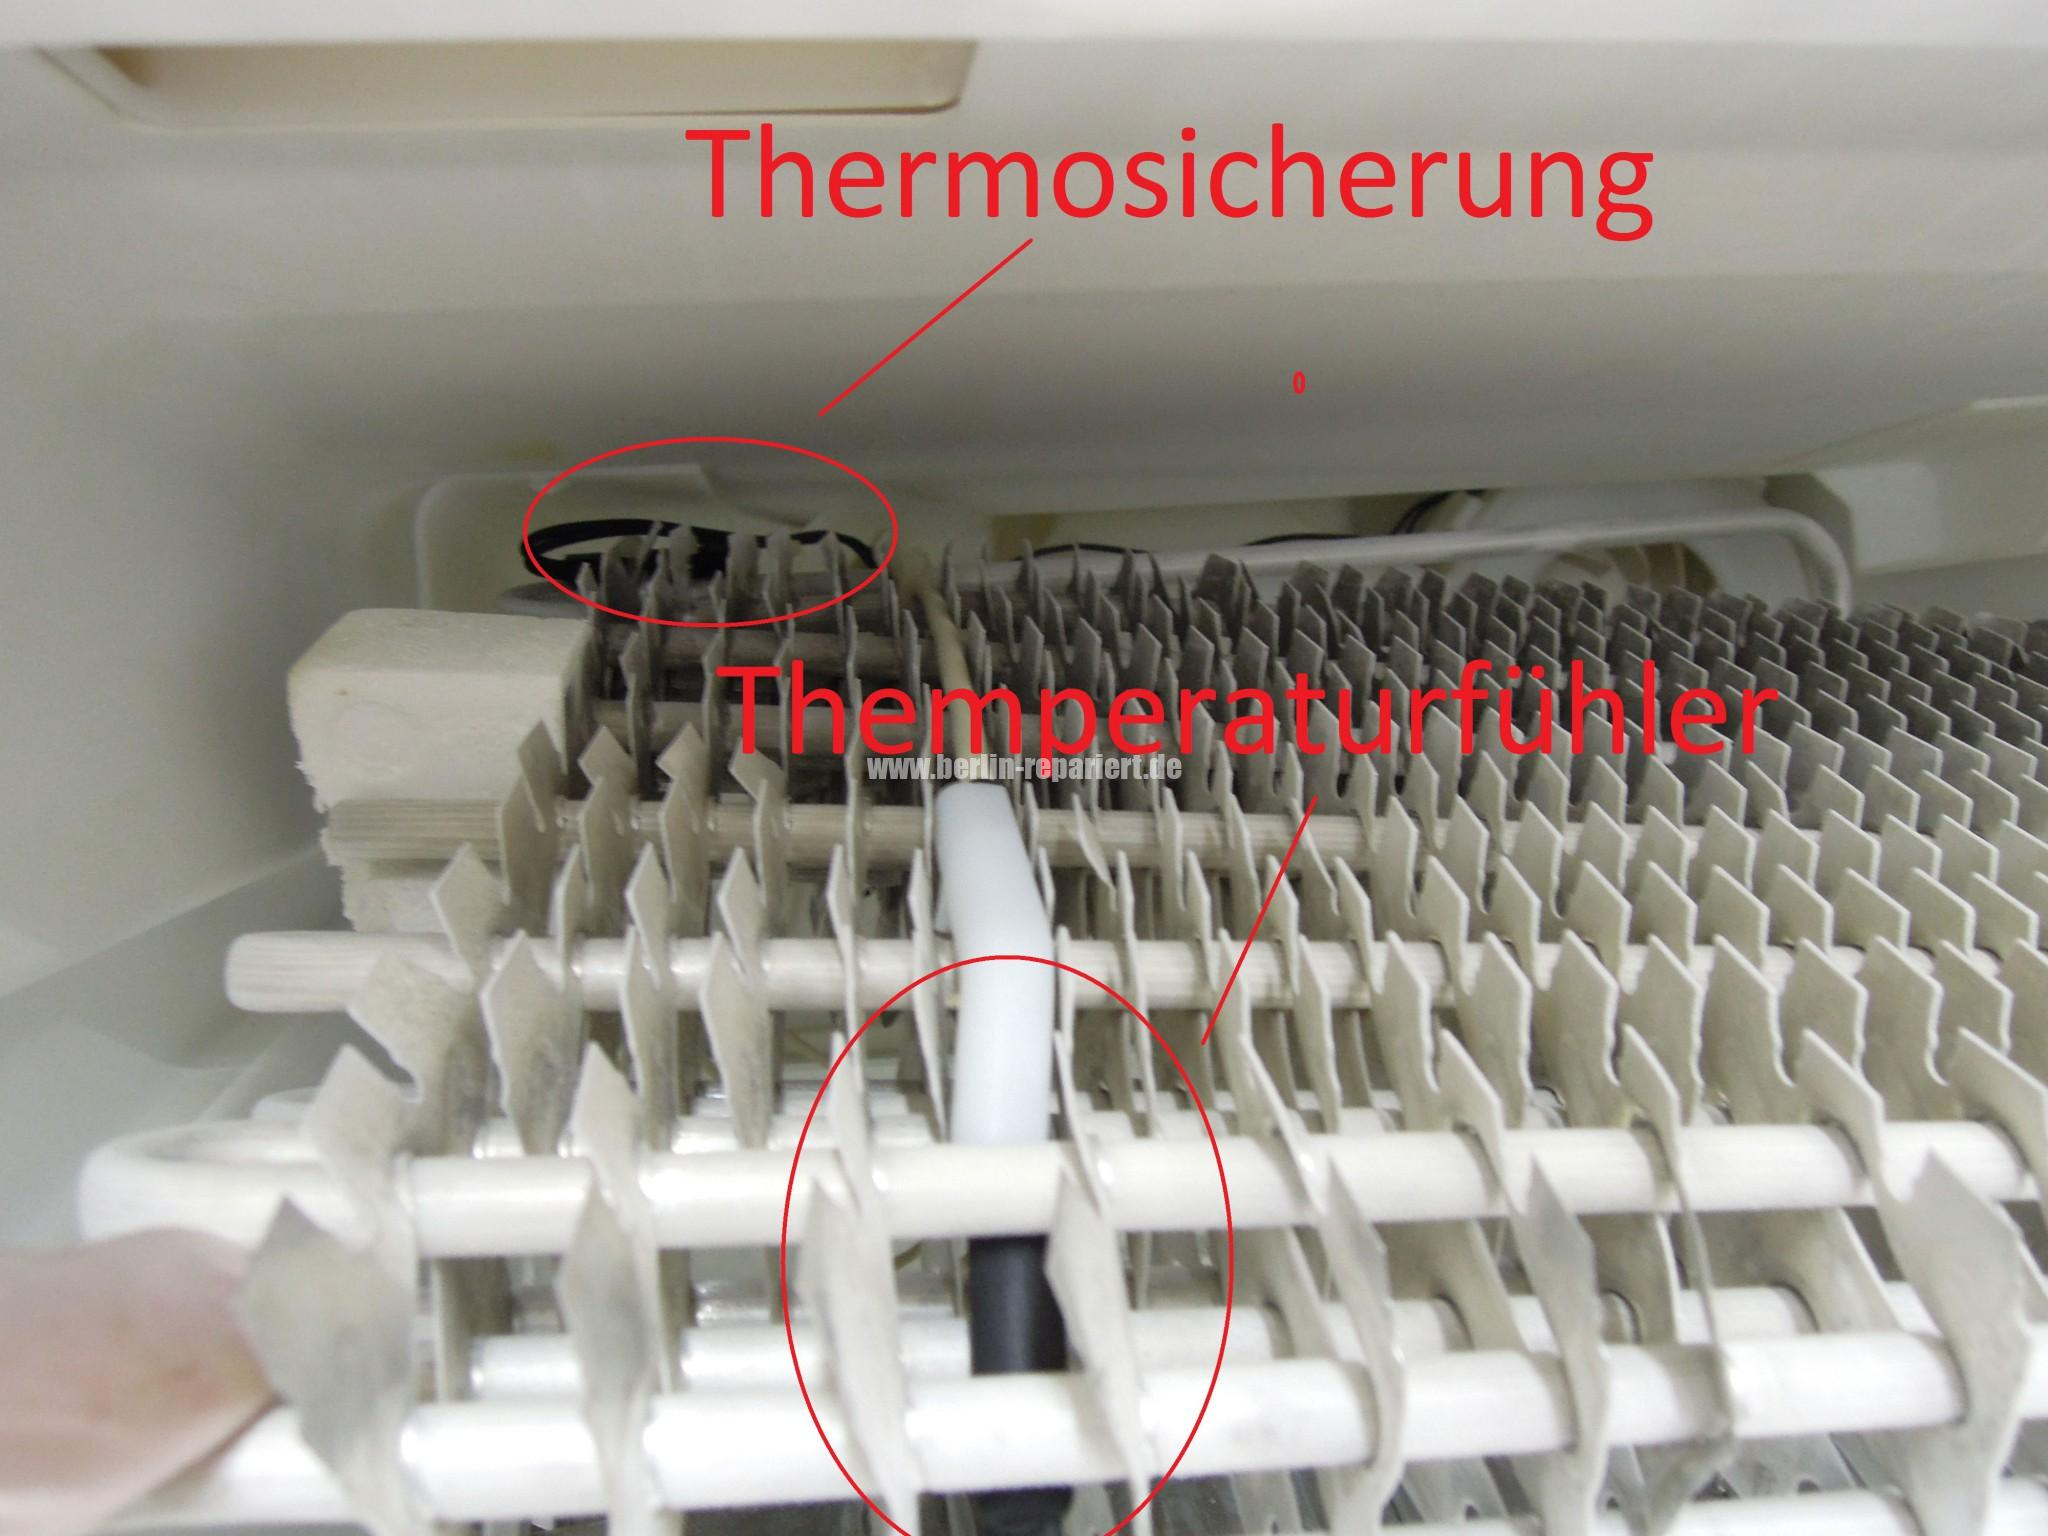 Bosch Kühlschrank Kühlt Nicht : Kühlschrank kühlt nicht mehr deptis u e inspirierendes design